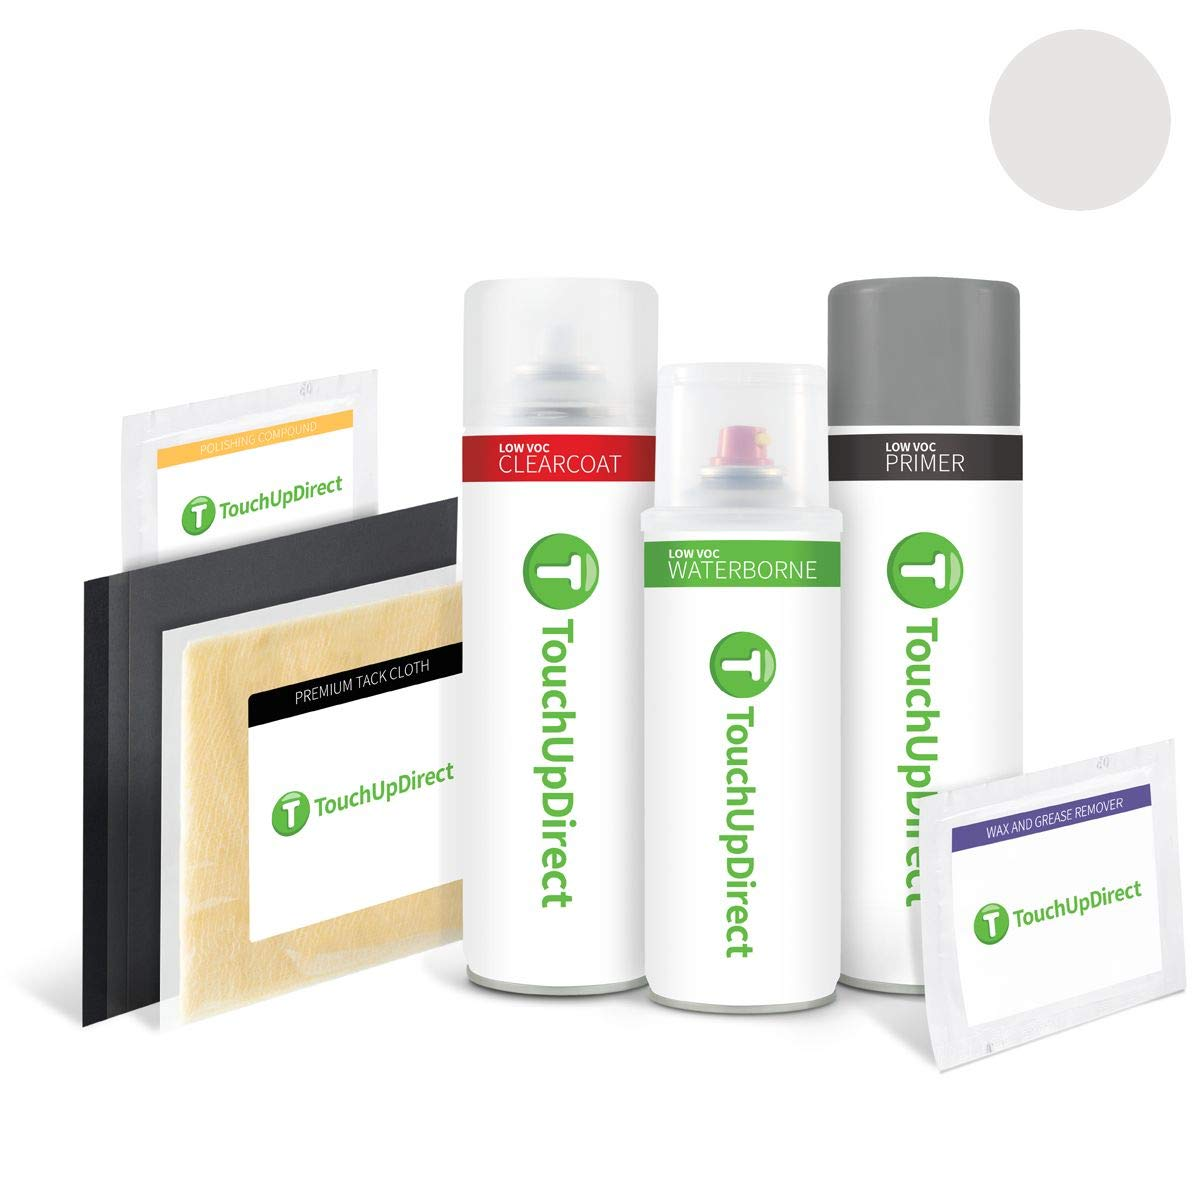 TouchUpDirect Exact Match Automotive Touch Up Paint Matches Lexus Atomic Silver Metallic (1J7) Aerosol - Platinum Package